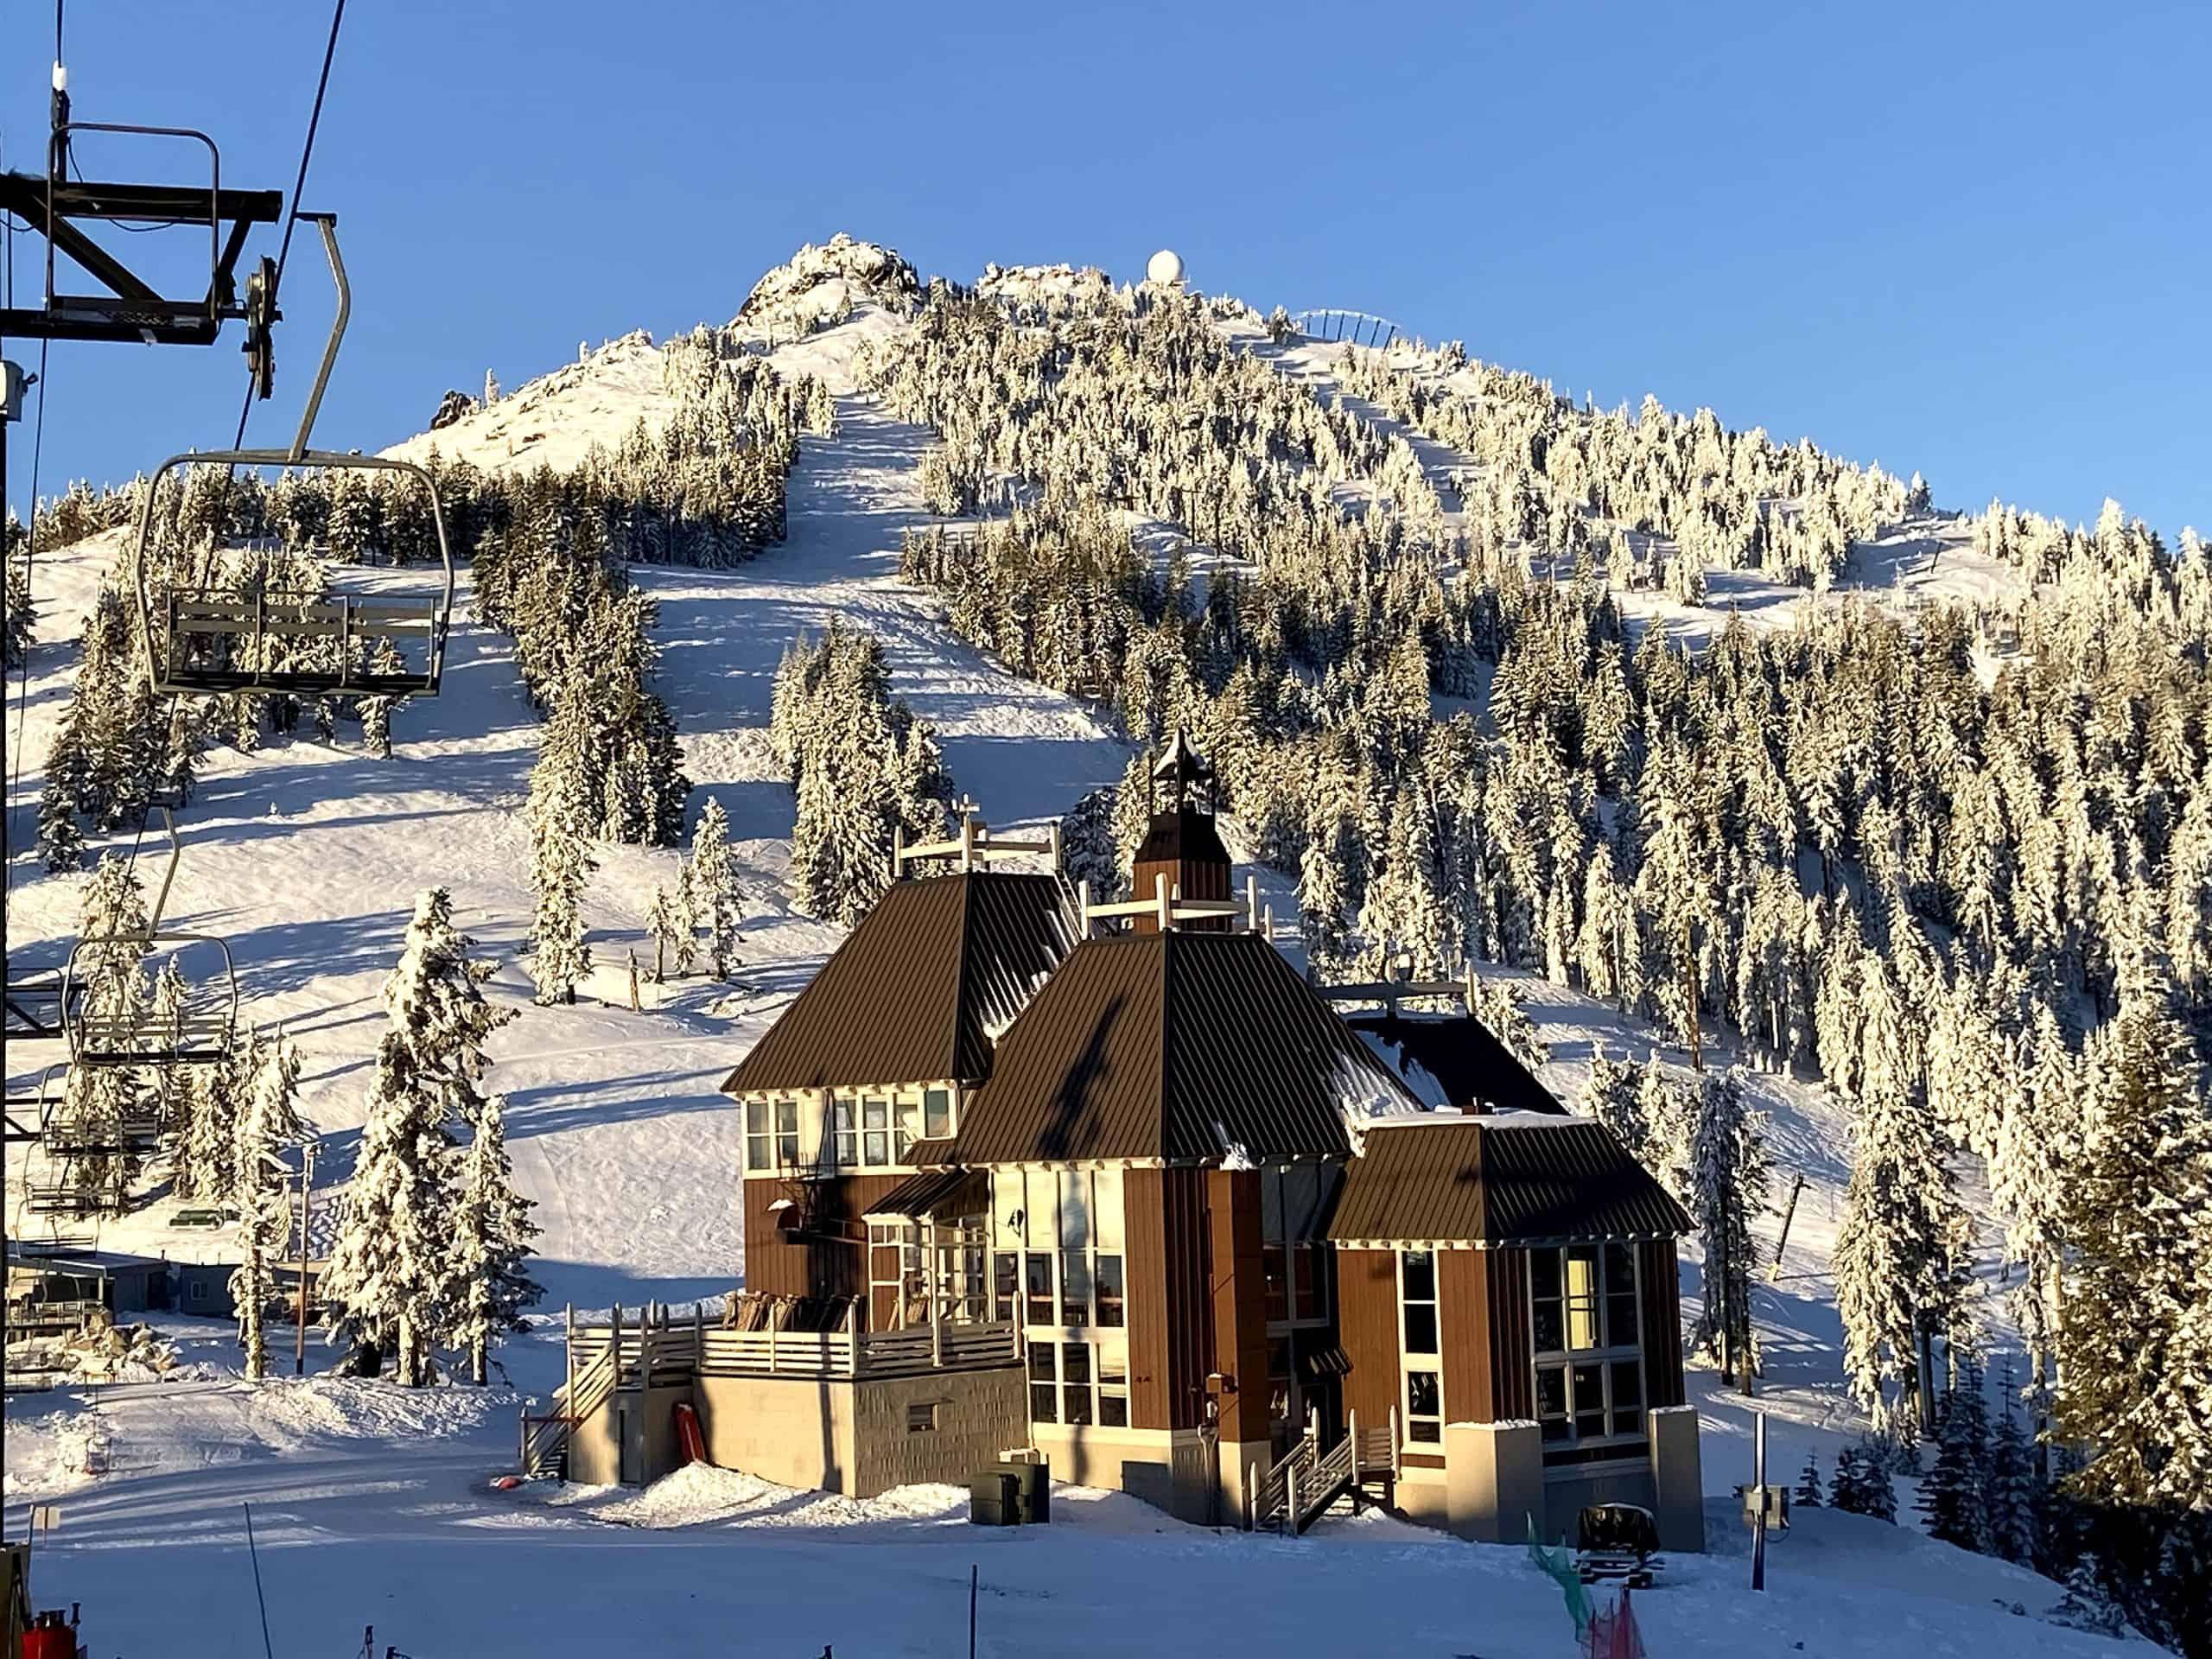 A sunny and snowy morning at Mt. Ashland Ski Area